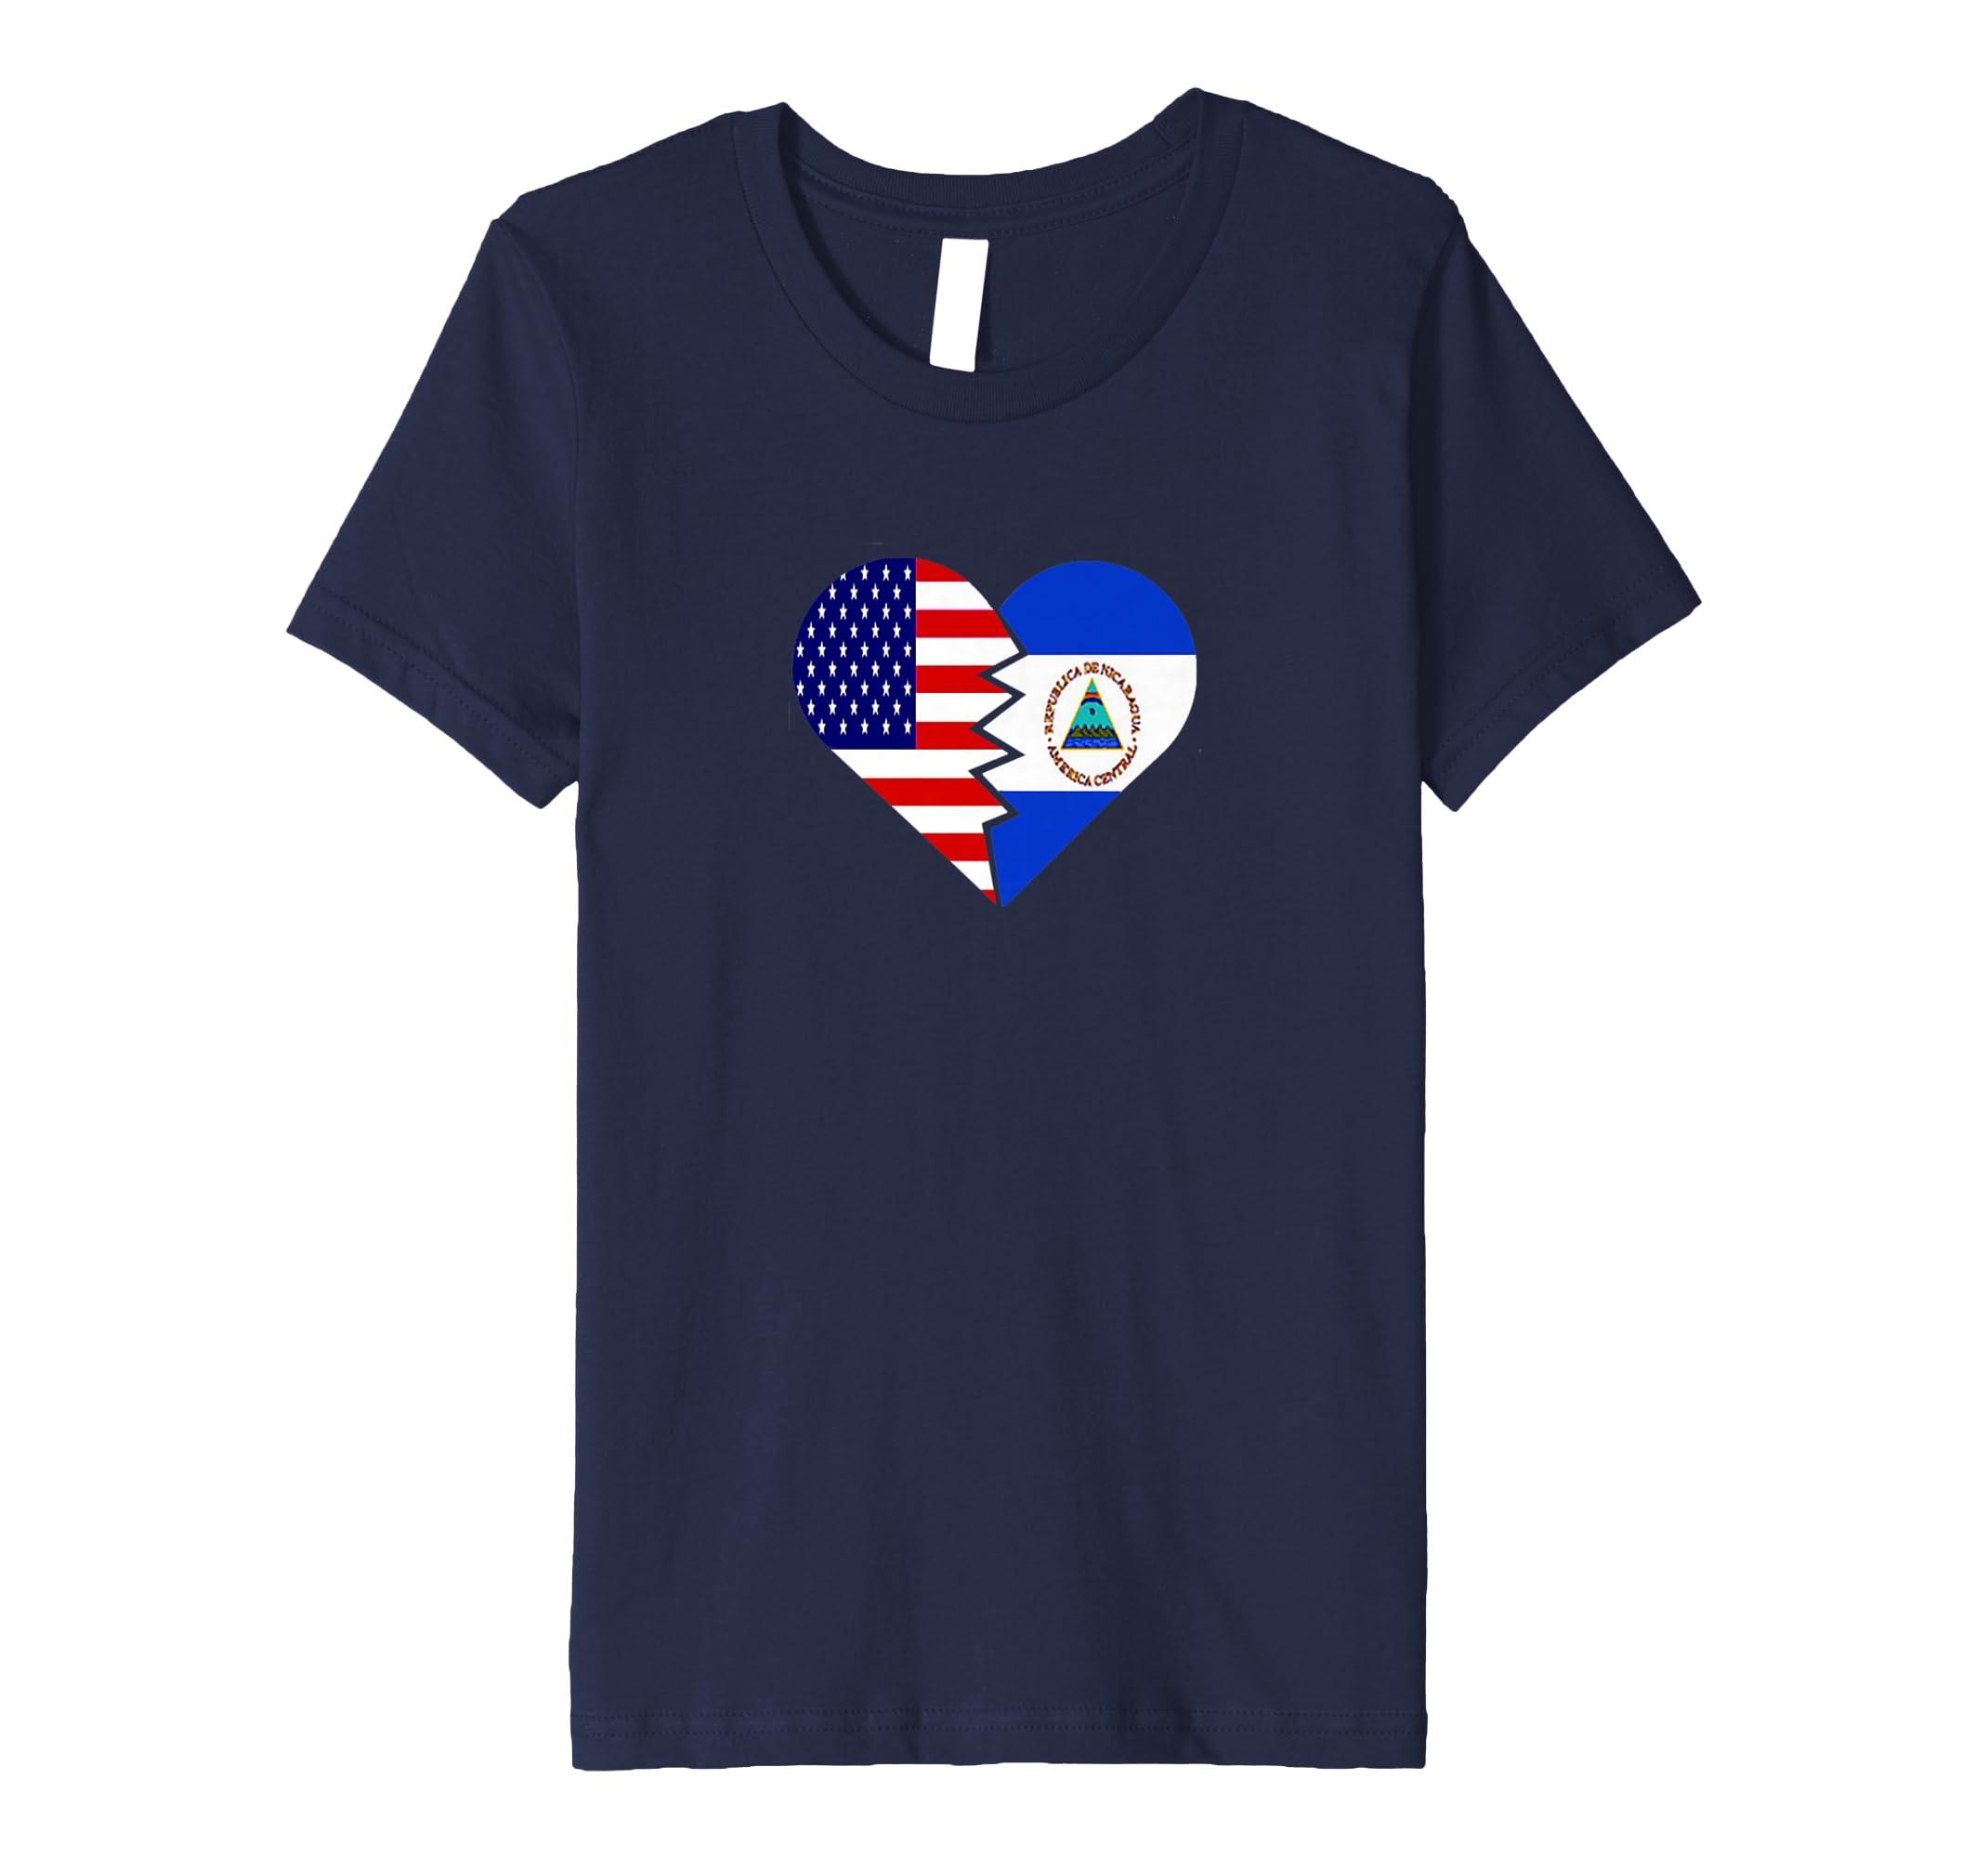 Amazon.com: Nicaragua T-Shirt USA Flag Patriot Latino Spanish 4th July: Clothing